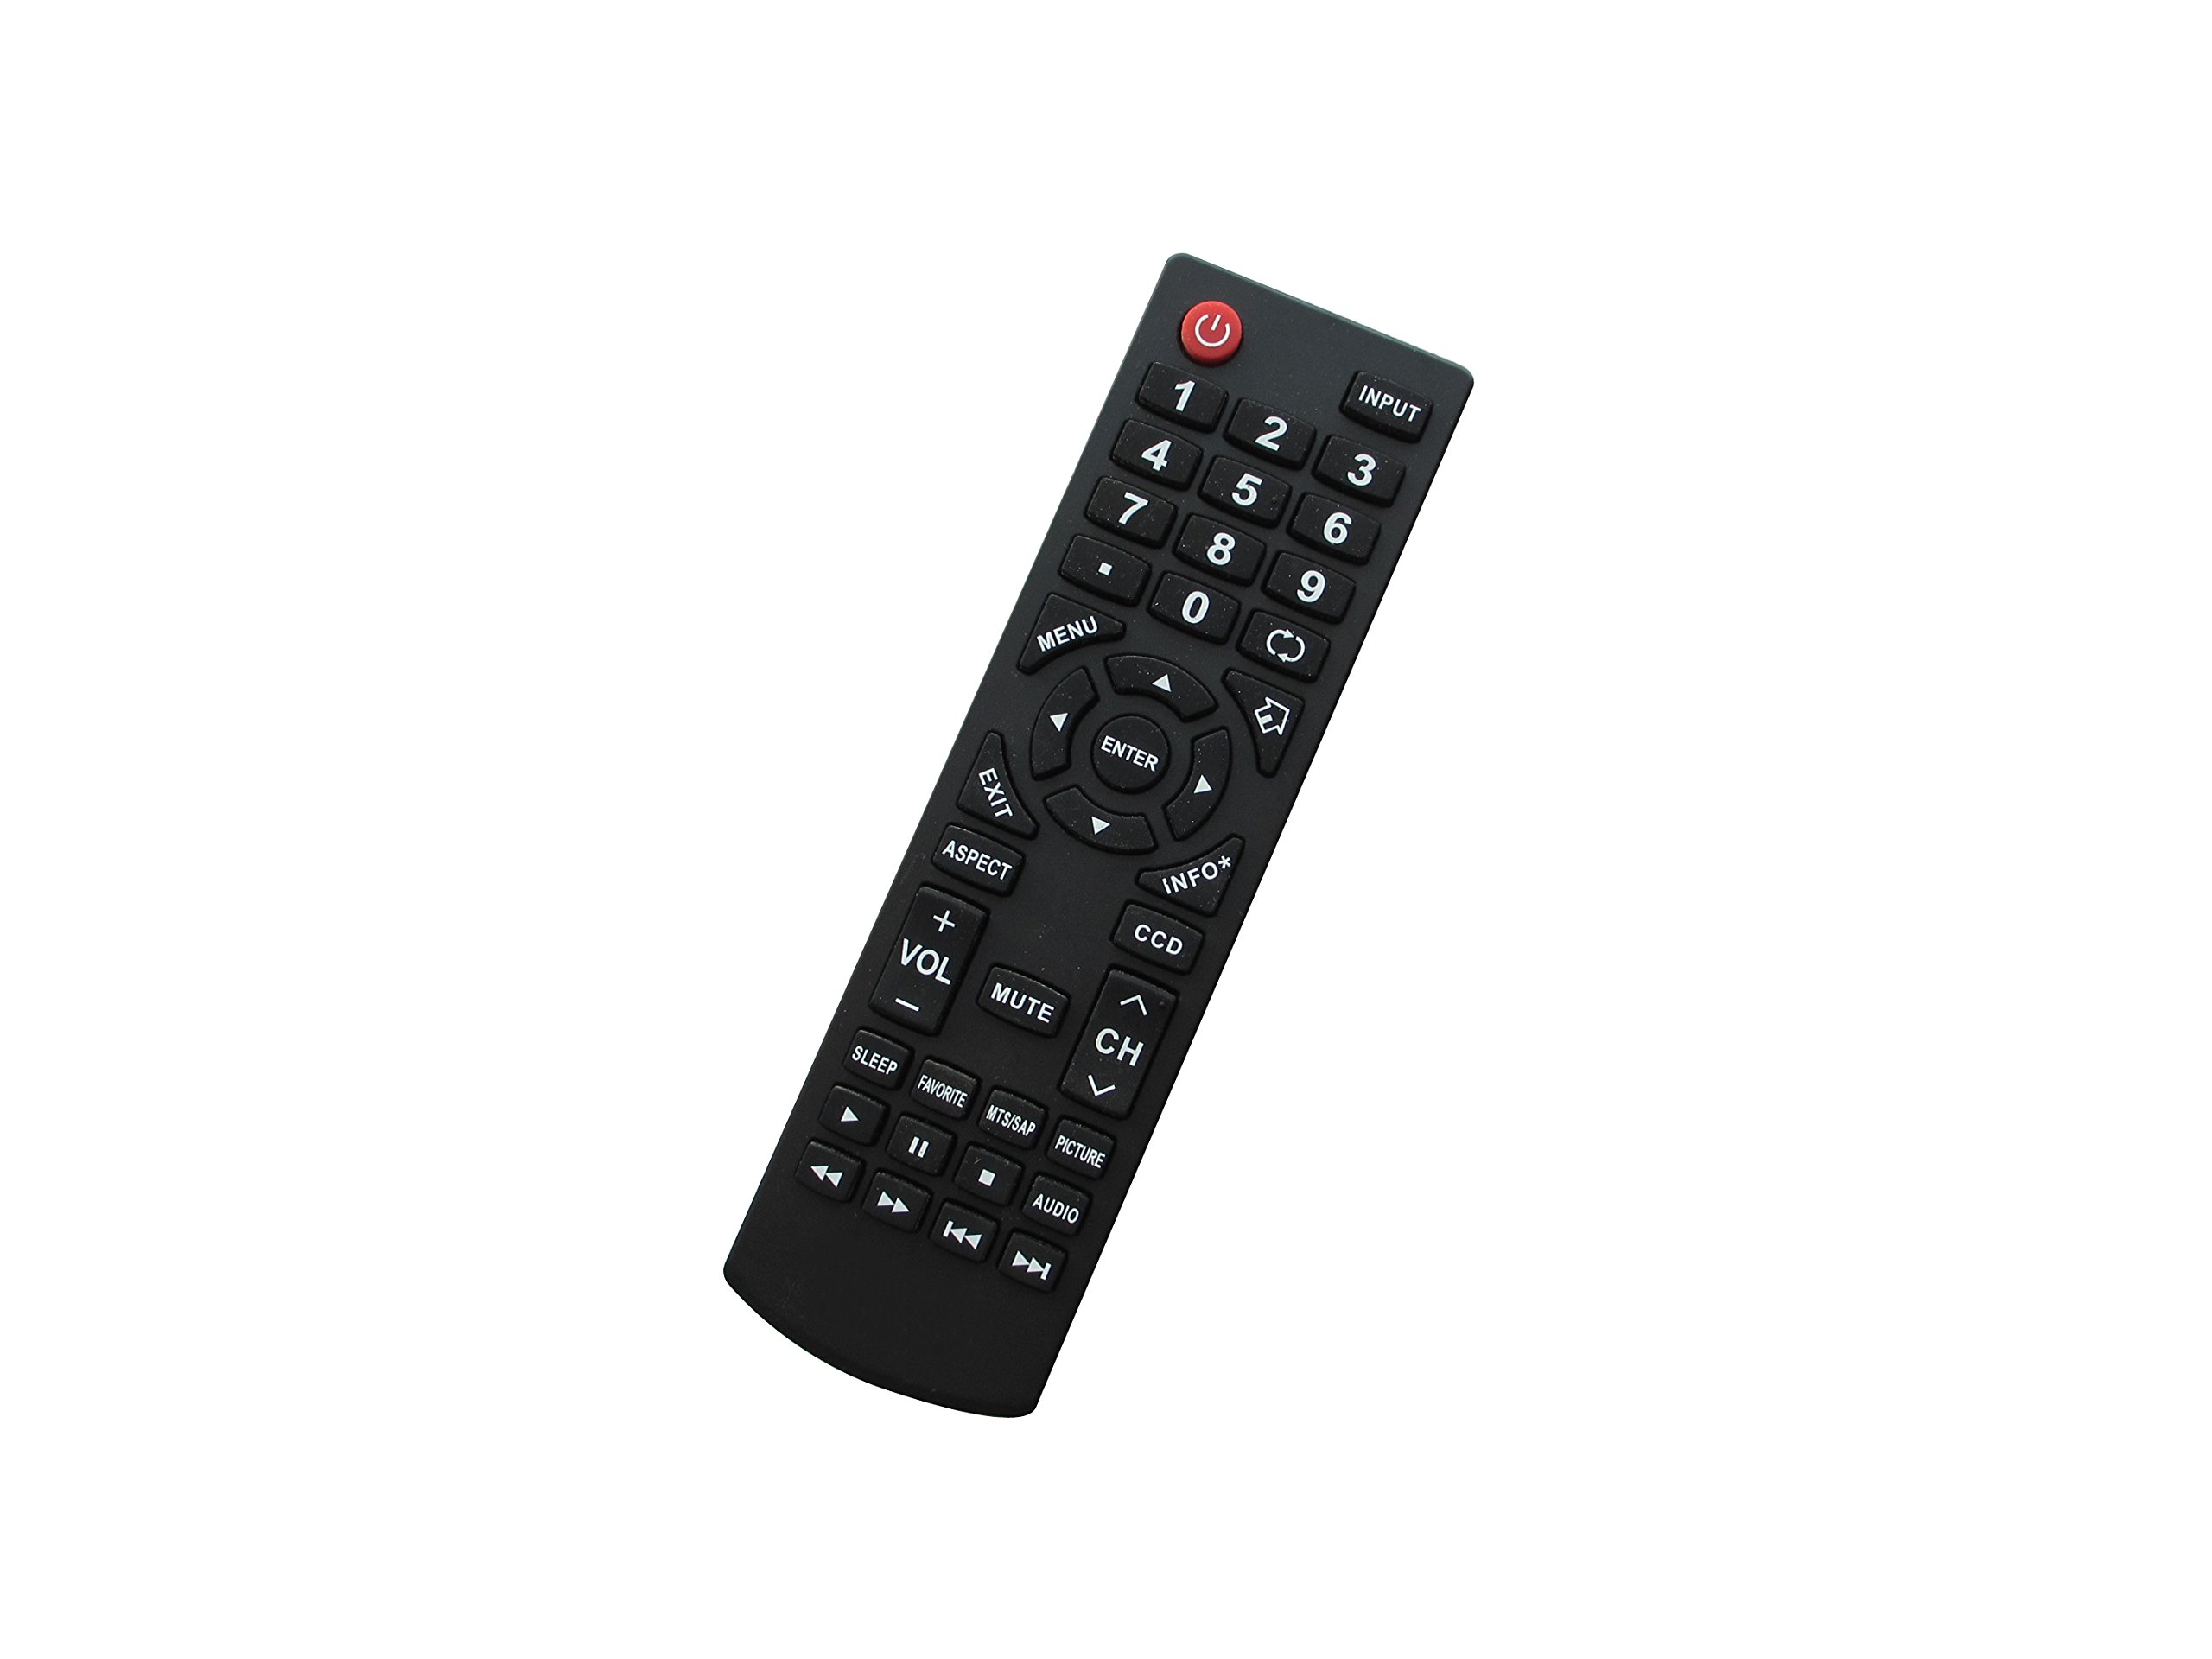 Control Remoto Dynex DX 26L150A11 DX 32L150A11 DX 37L200A...